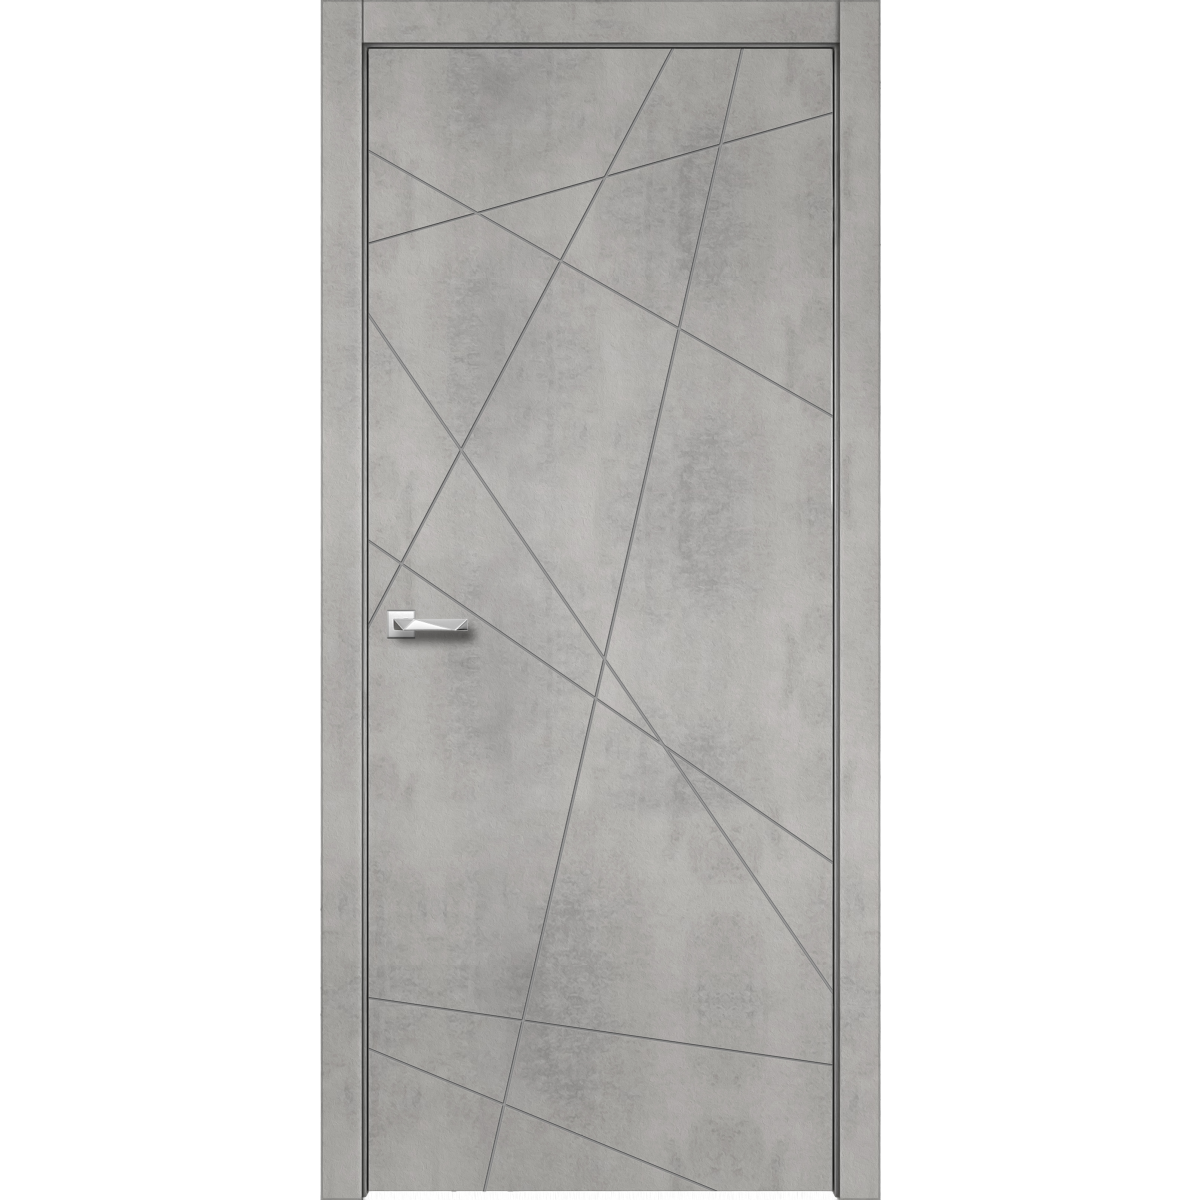 Дверное полотно Loyard Севилья МП_0365 2000х900х44 мм МДФ